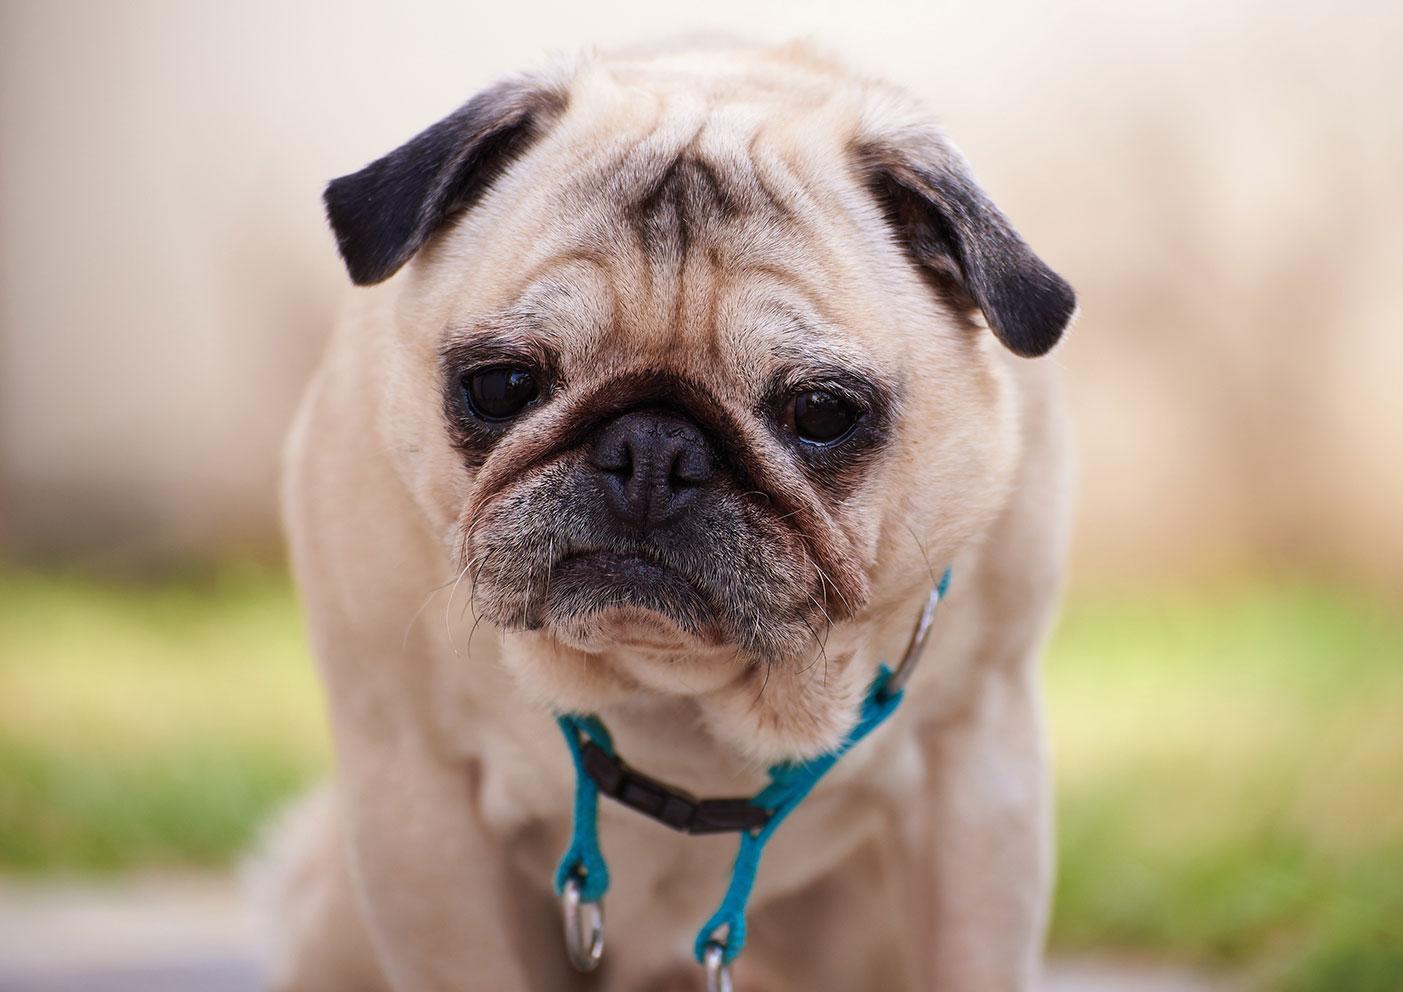 I Love Pugs 2017 Calendar I Love Pugs